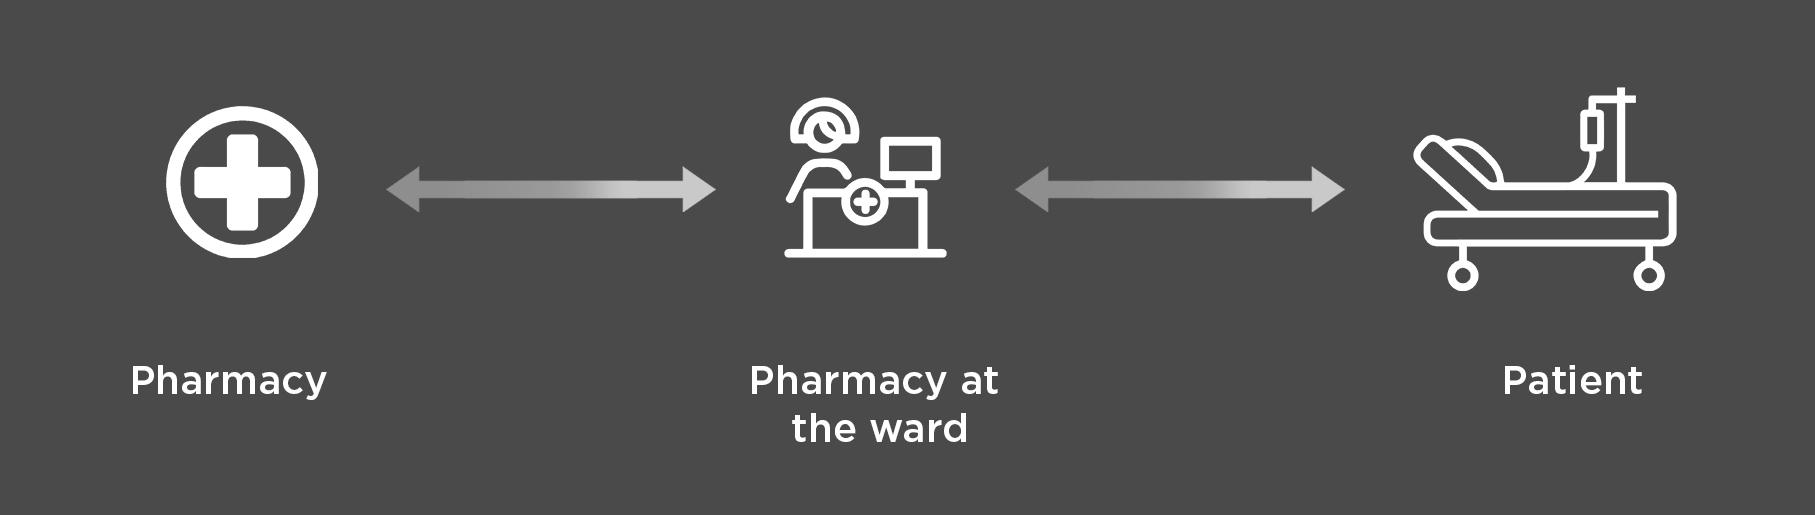 Logistics medication pharmacy top atient ward amis